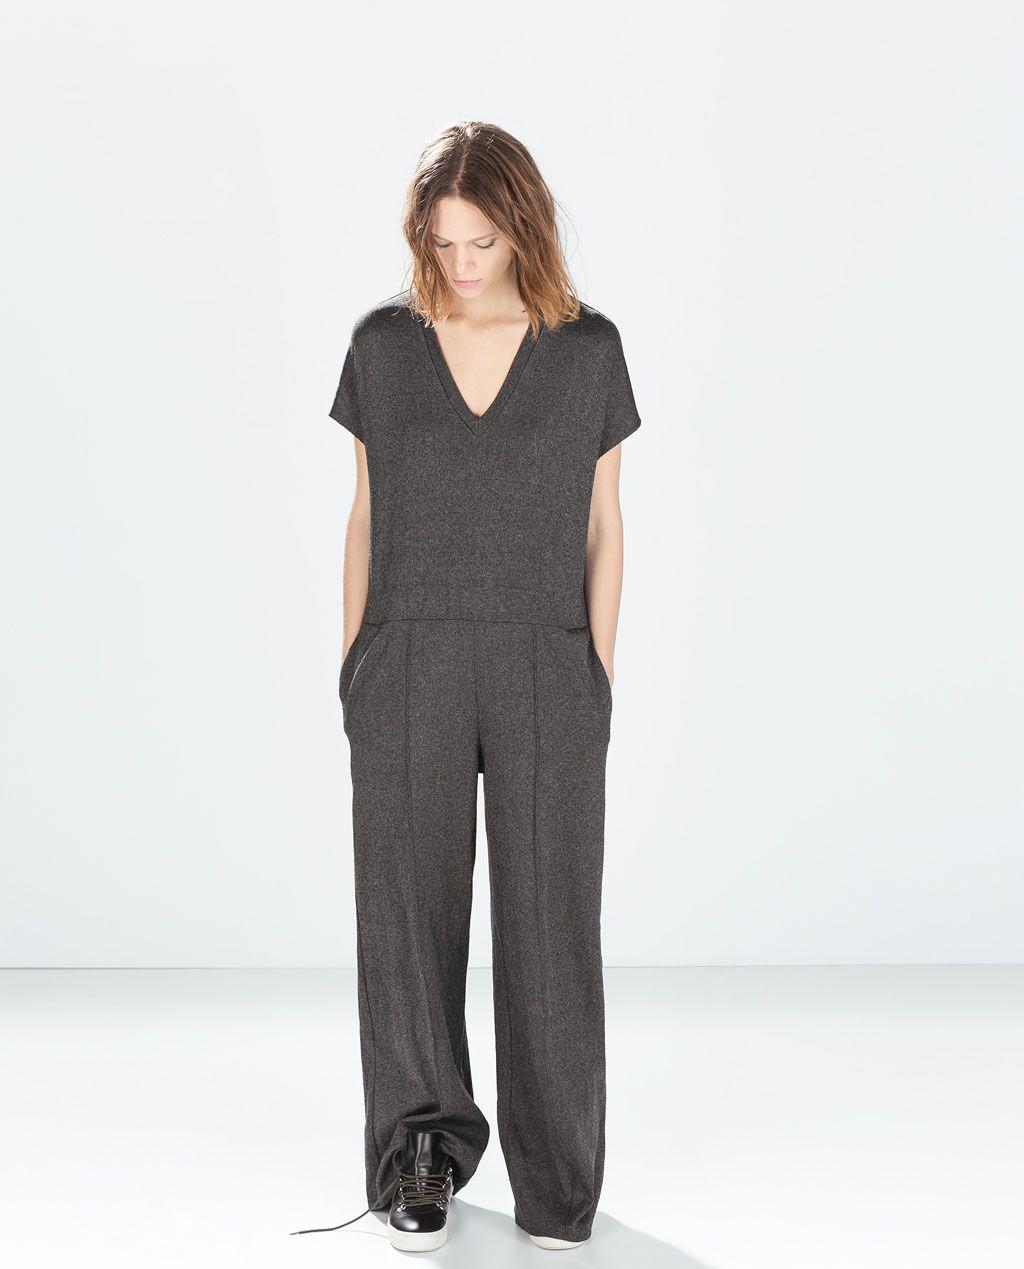 zara femme combi pantalon large ropa zara pinterest pantalones anchos zara y mono. Black Bedroom Furniture Sets. Home Design Ideas